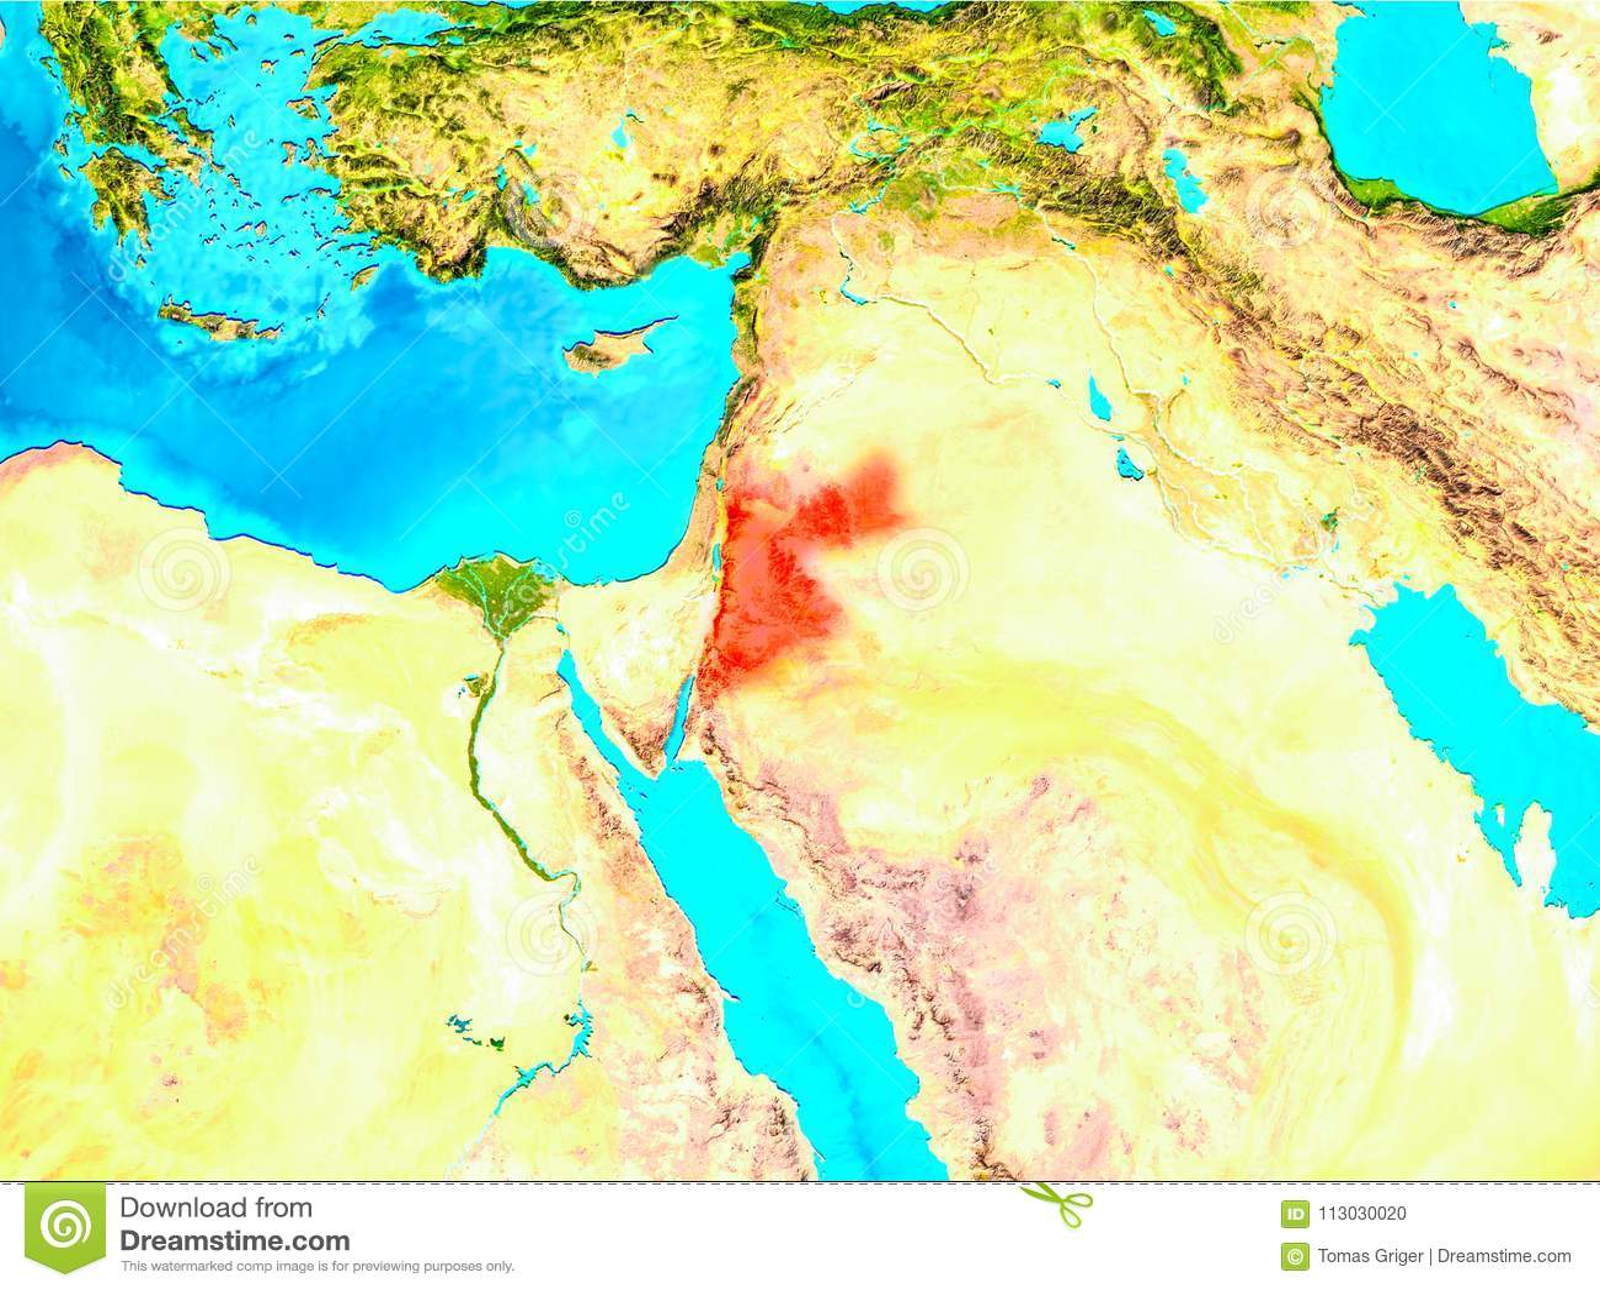 Jordania en rojo en la tierra